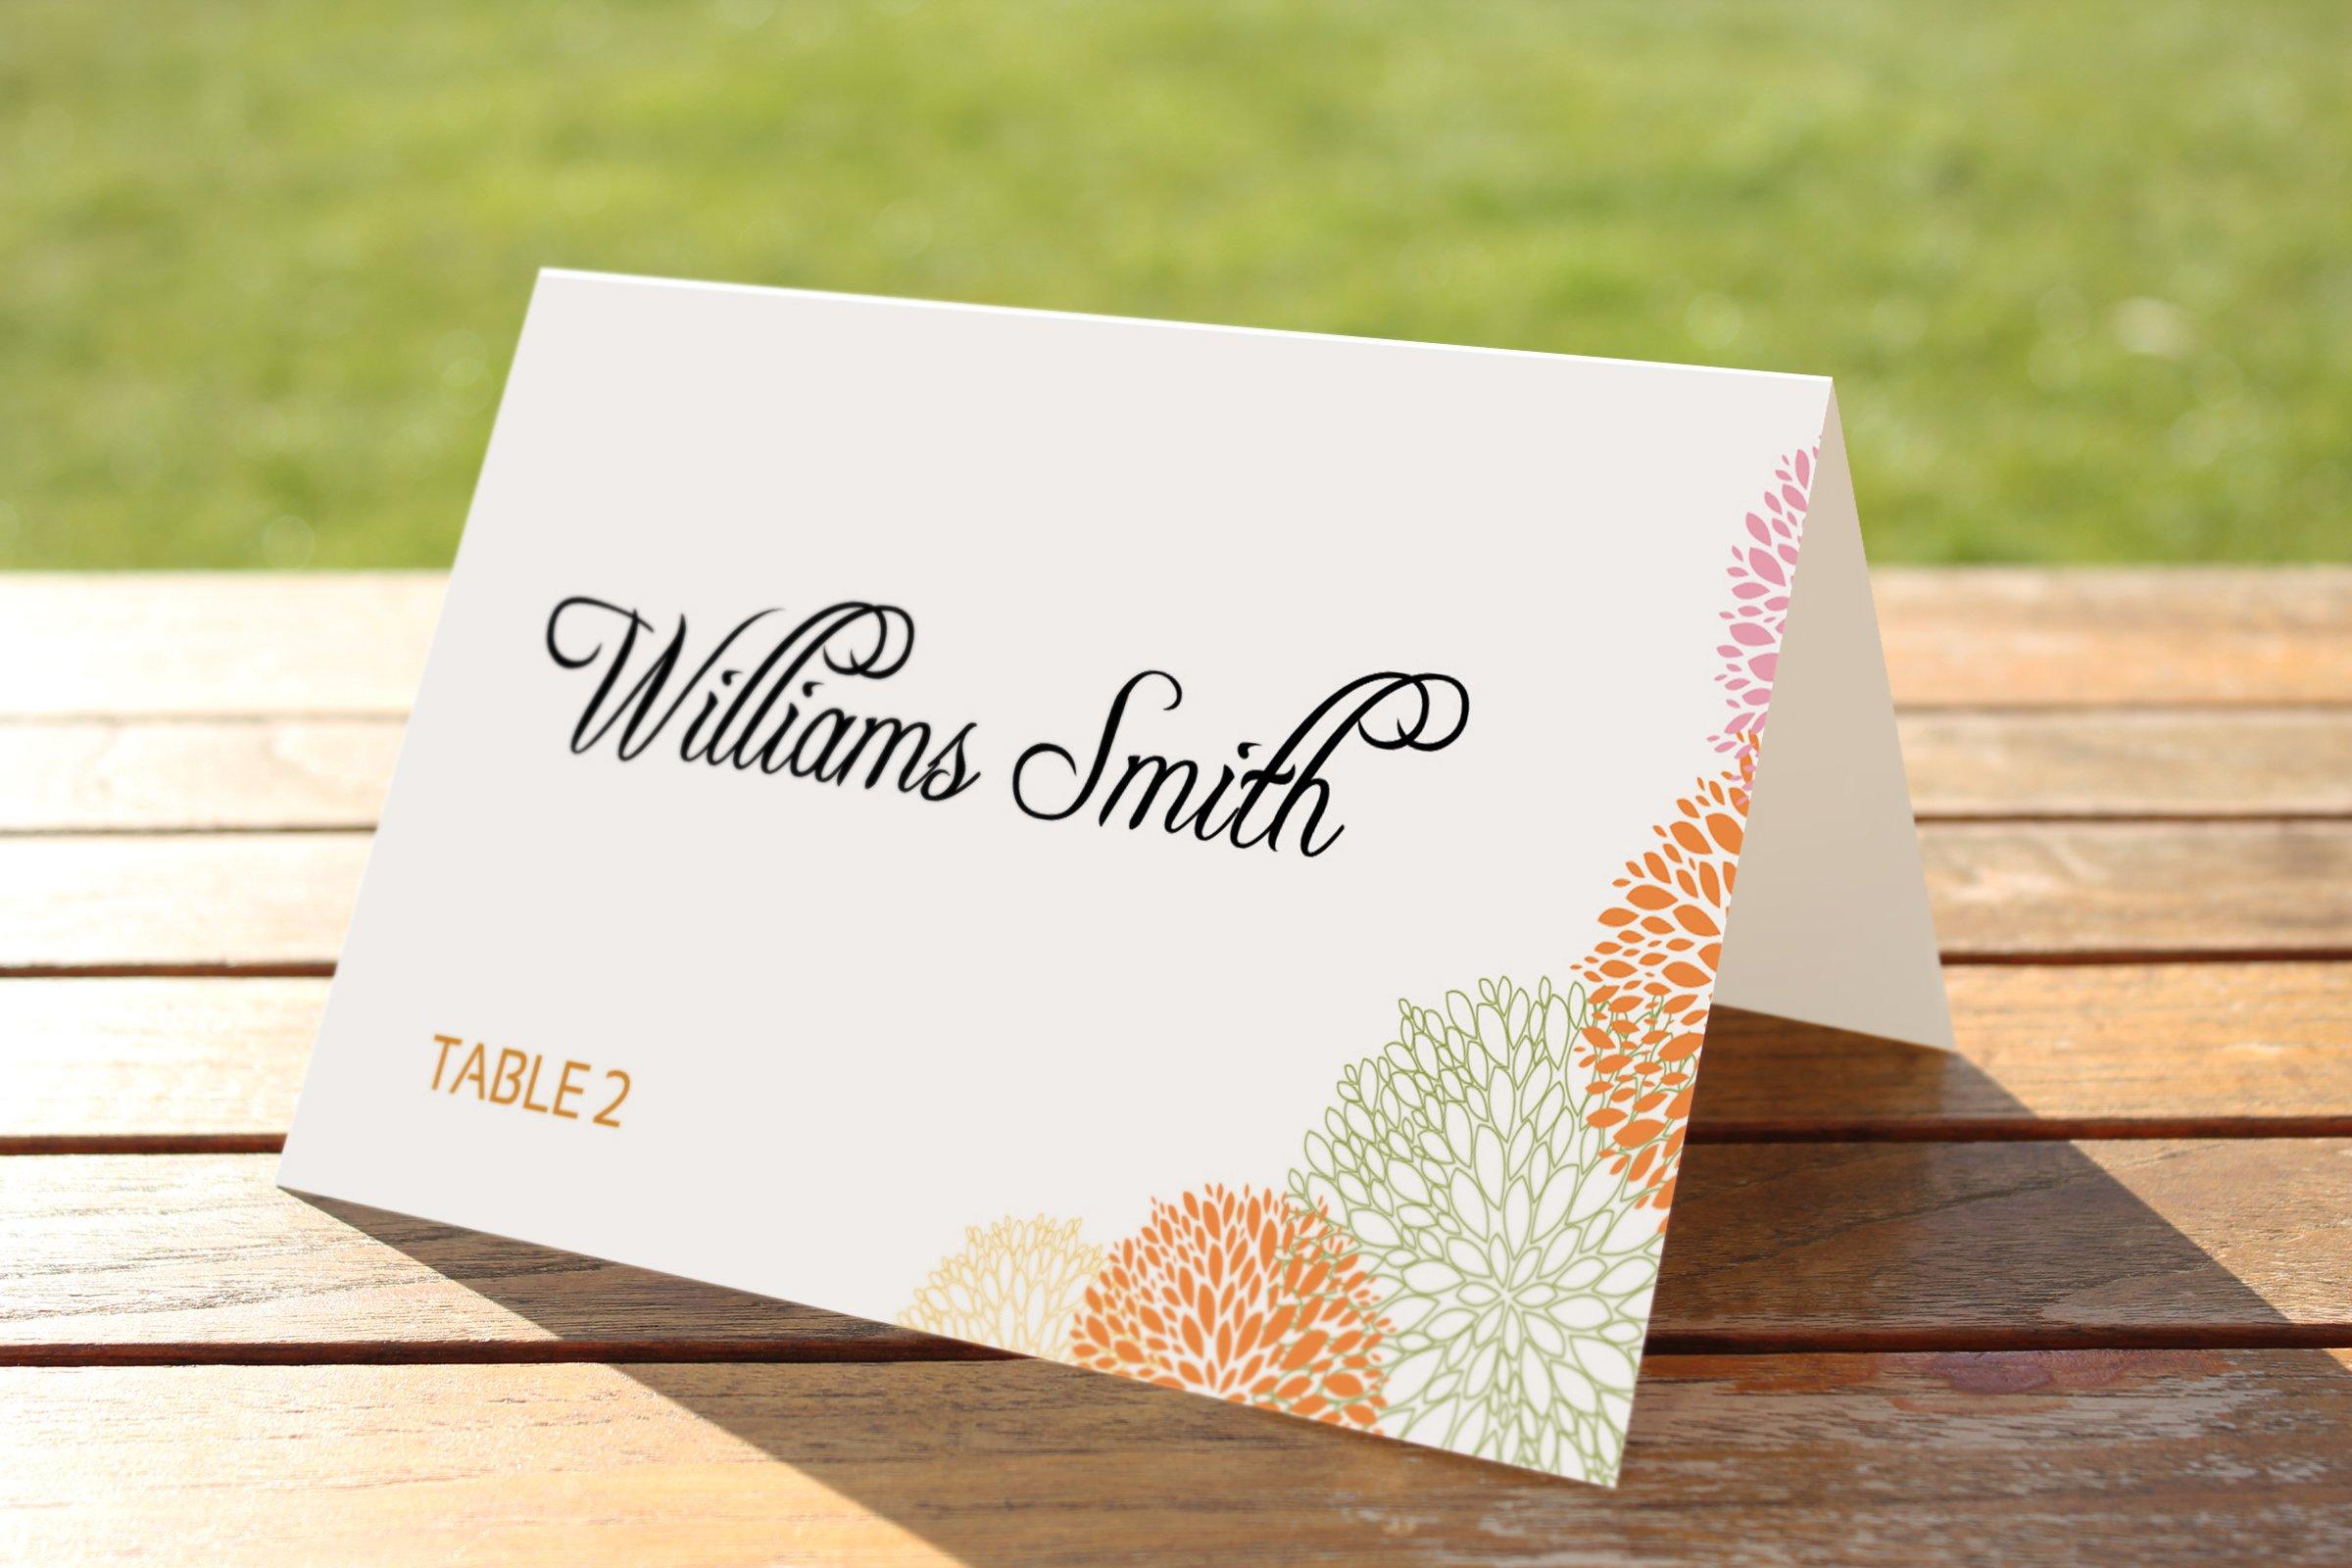 Wedding Place Card Template Templates Creative Market - Menu place cards template